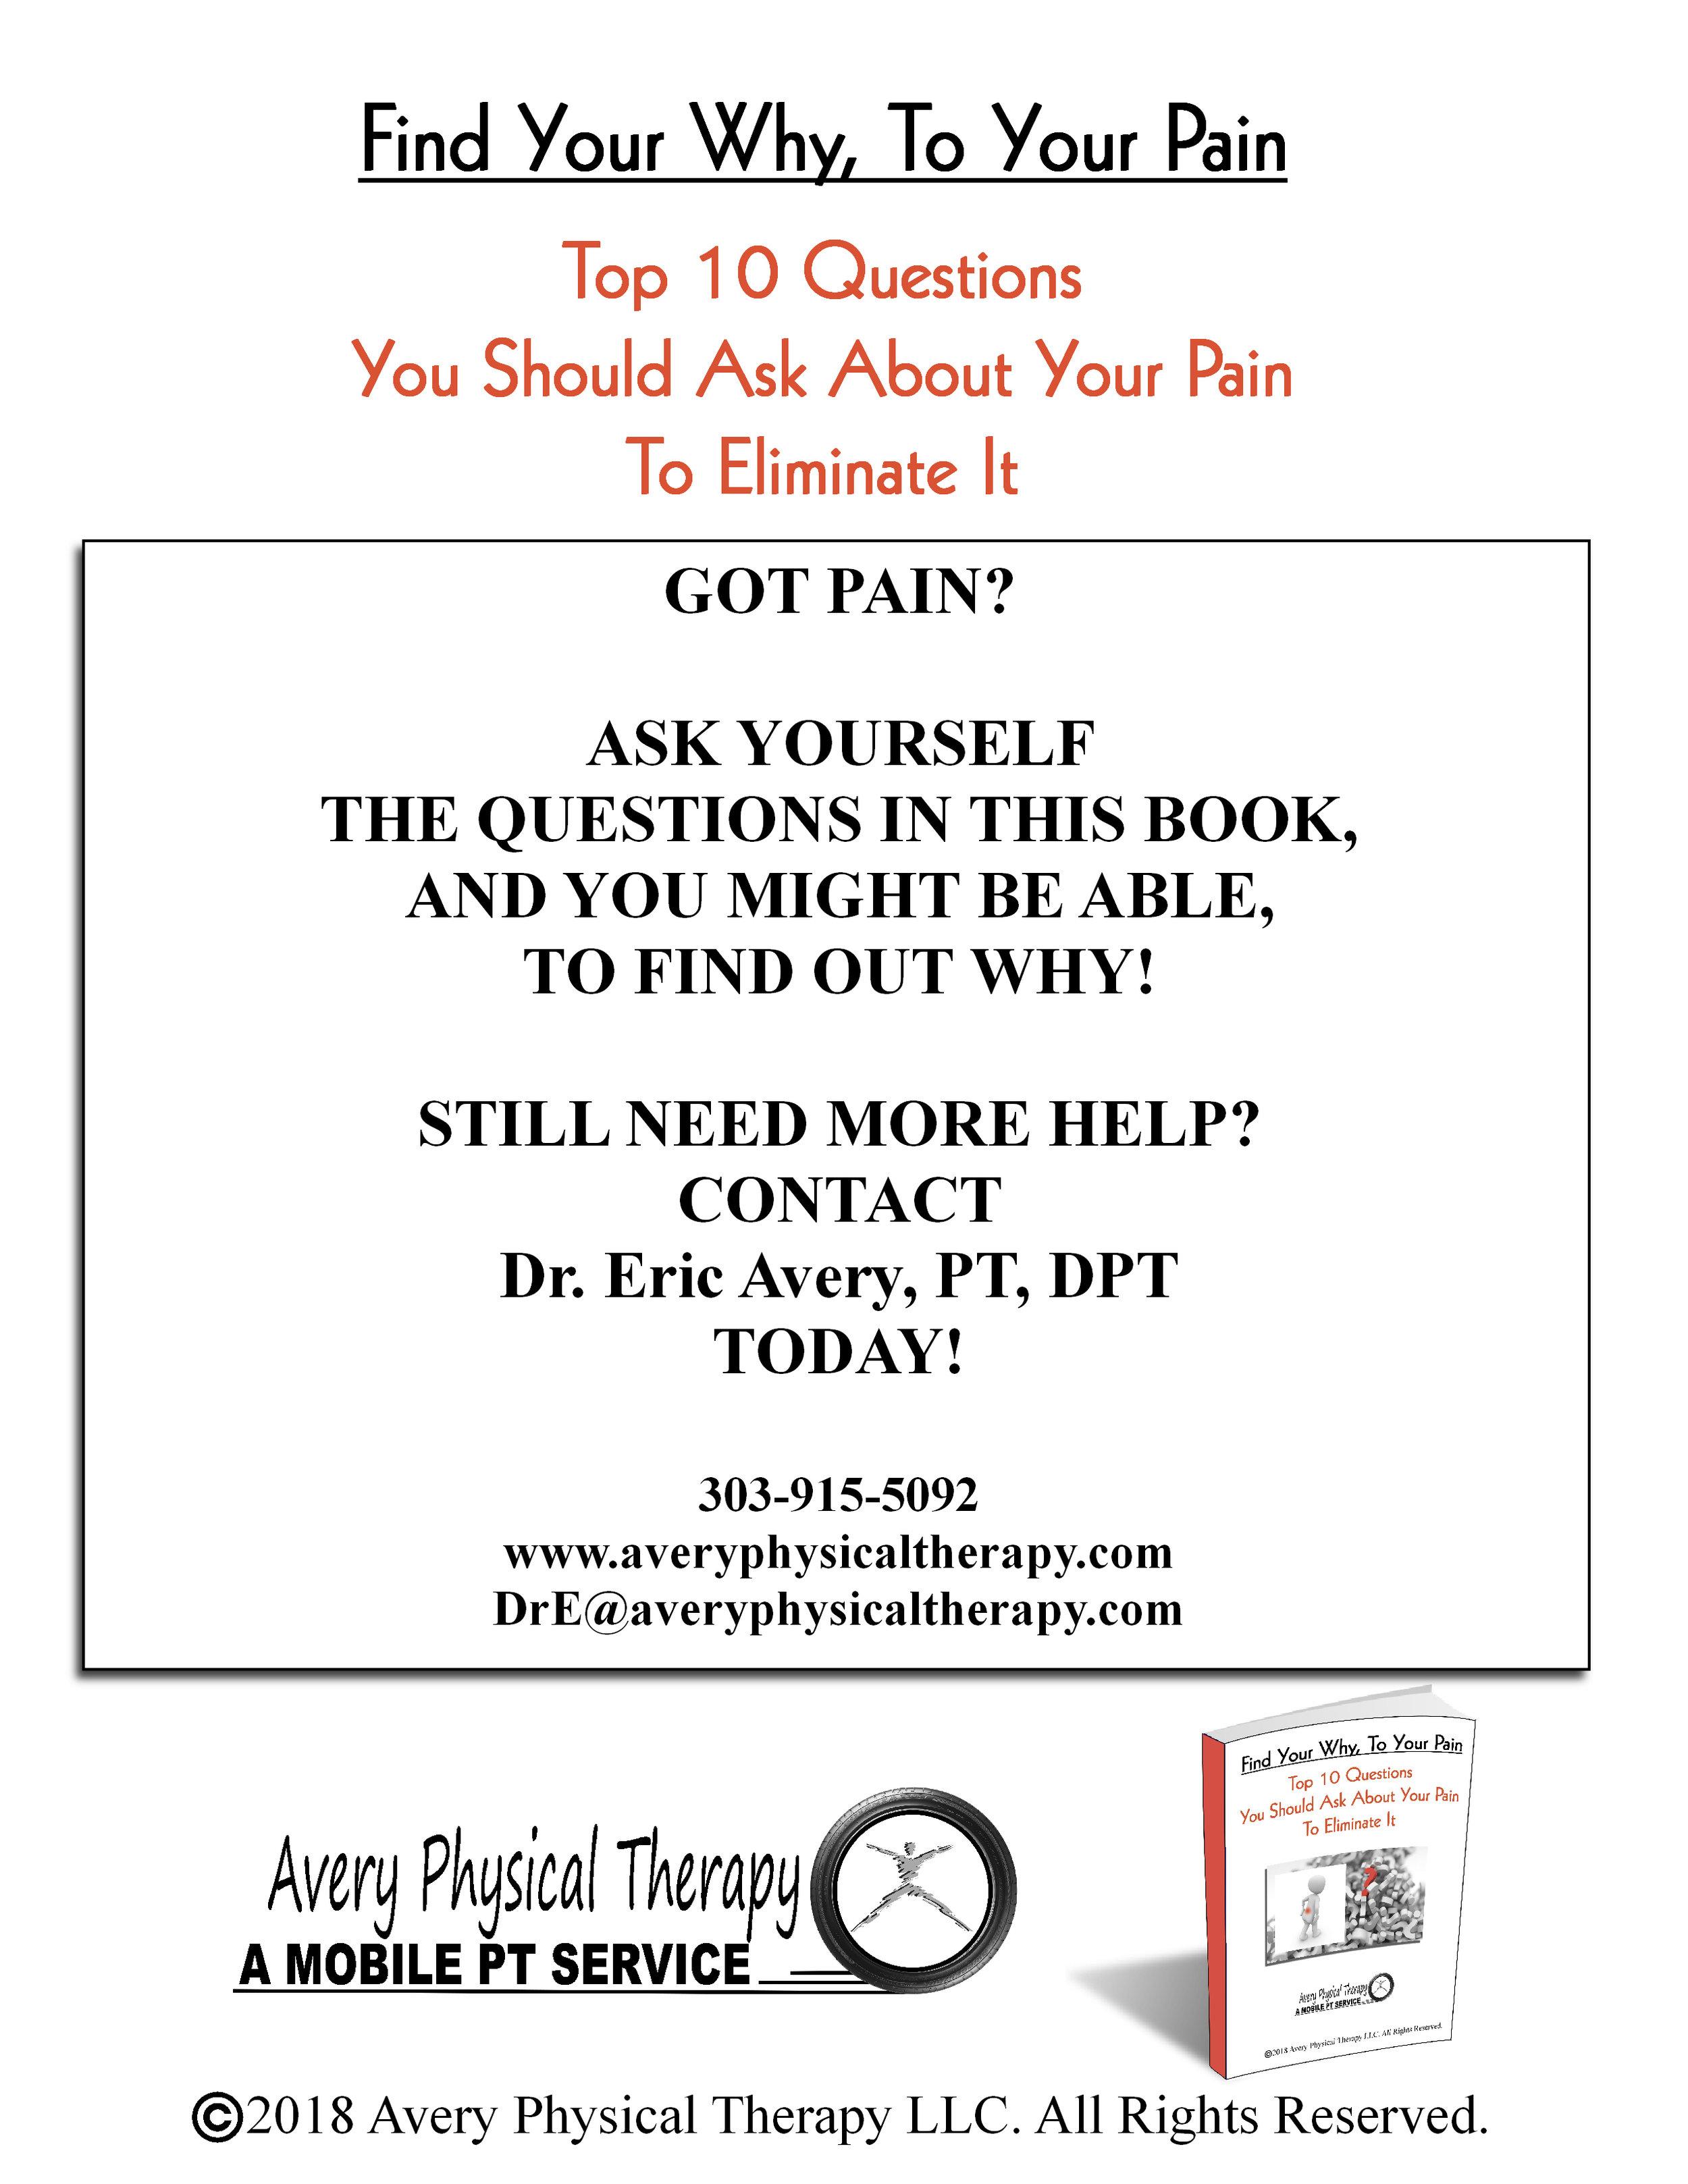 Top 10 Pain Questions 4-6B.JPG